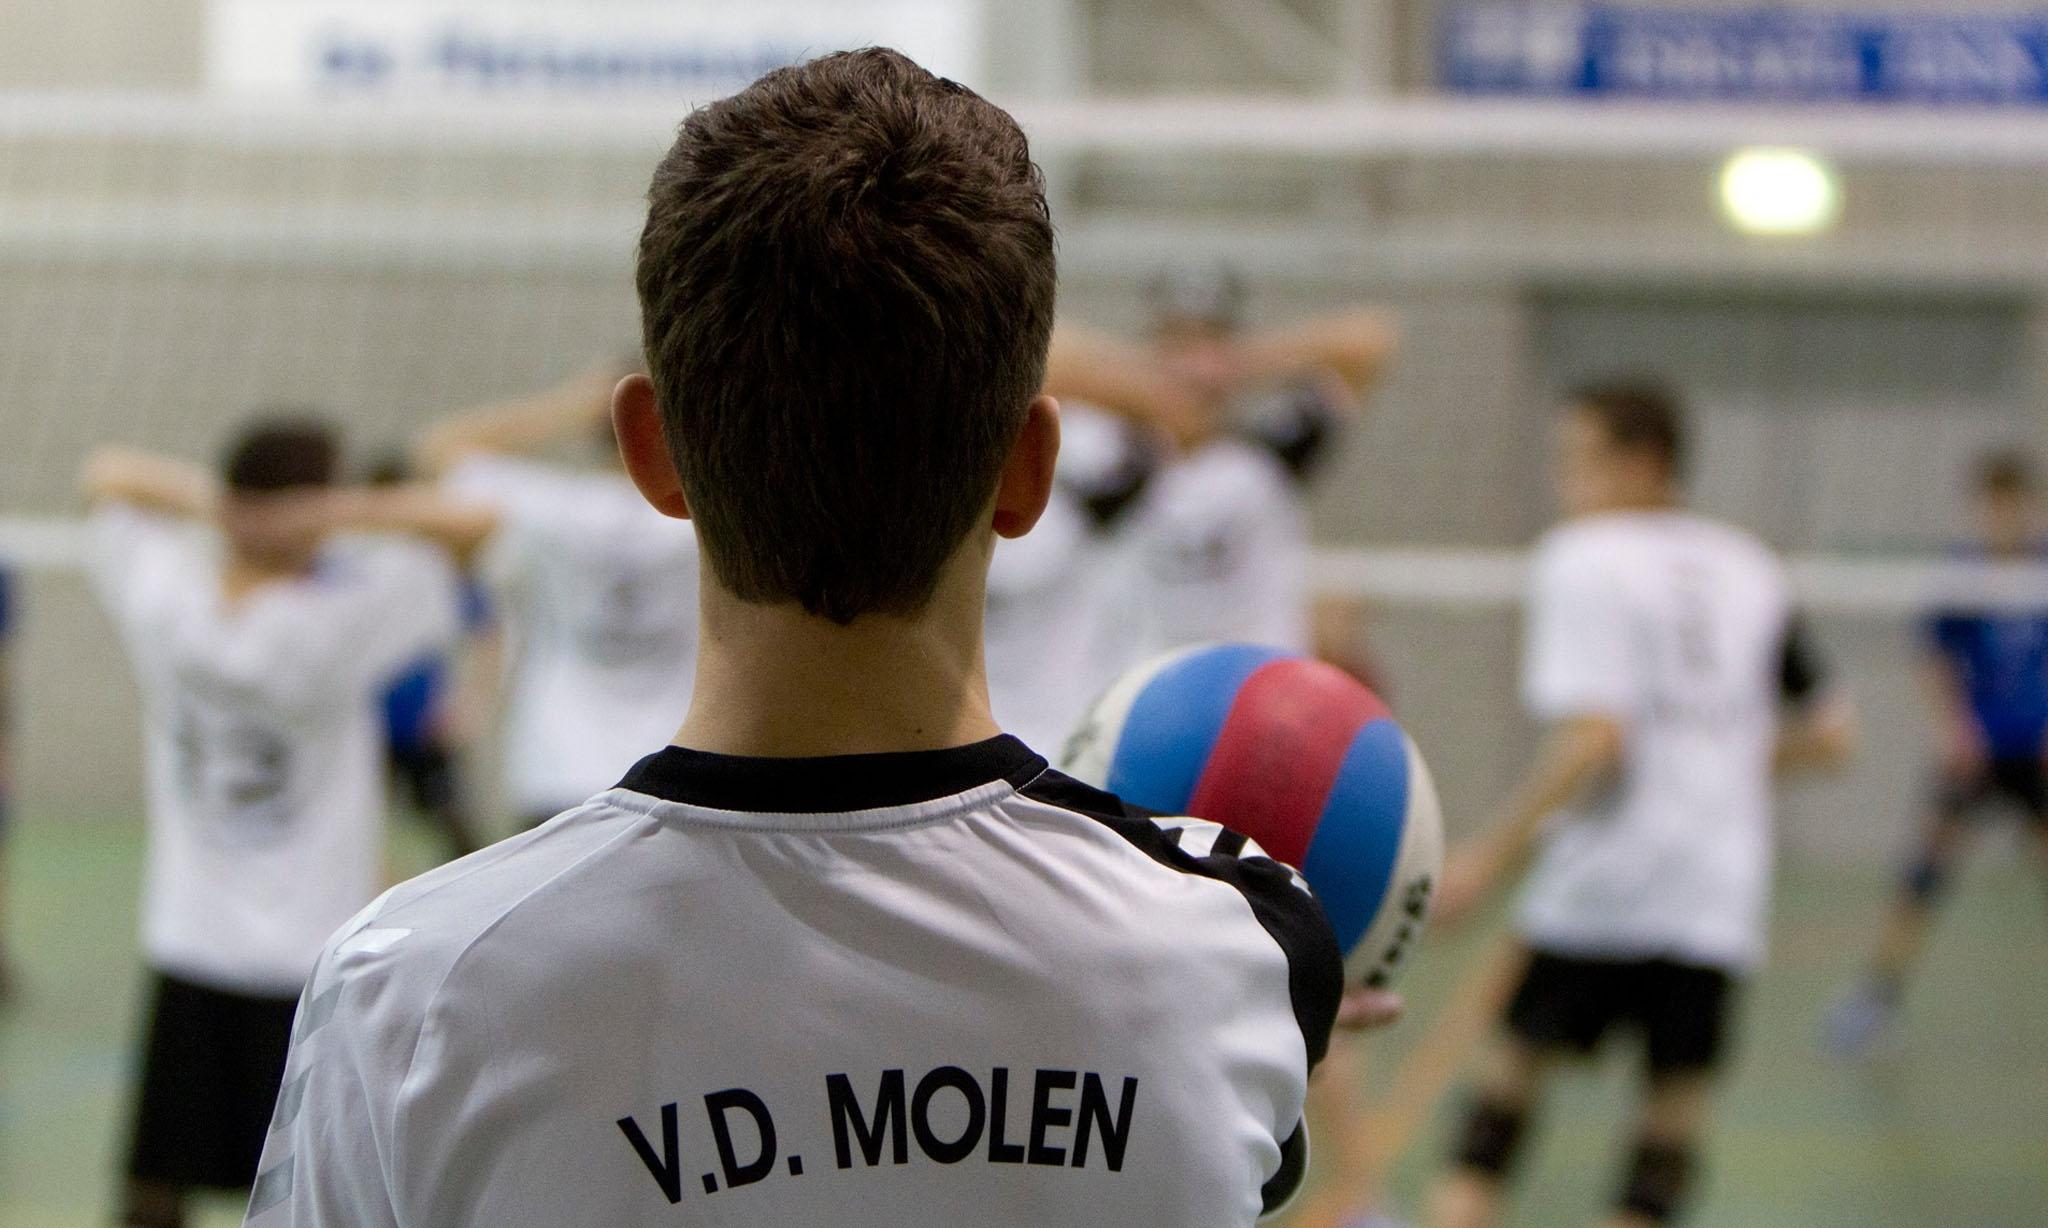 int-toernooi-apeldoorn-2013-2